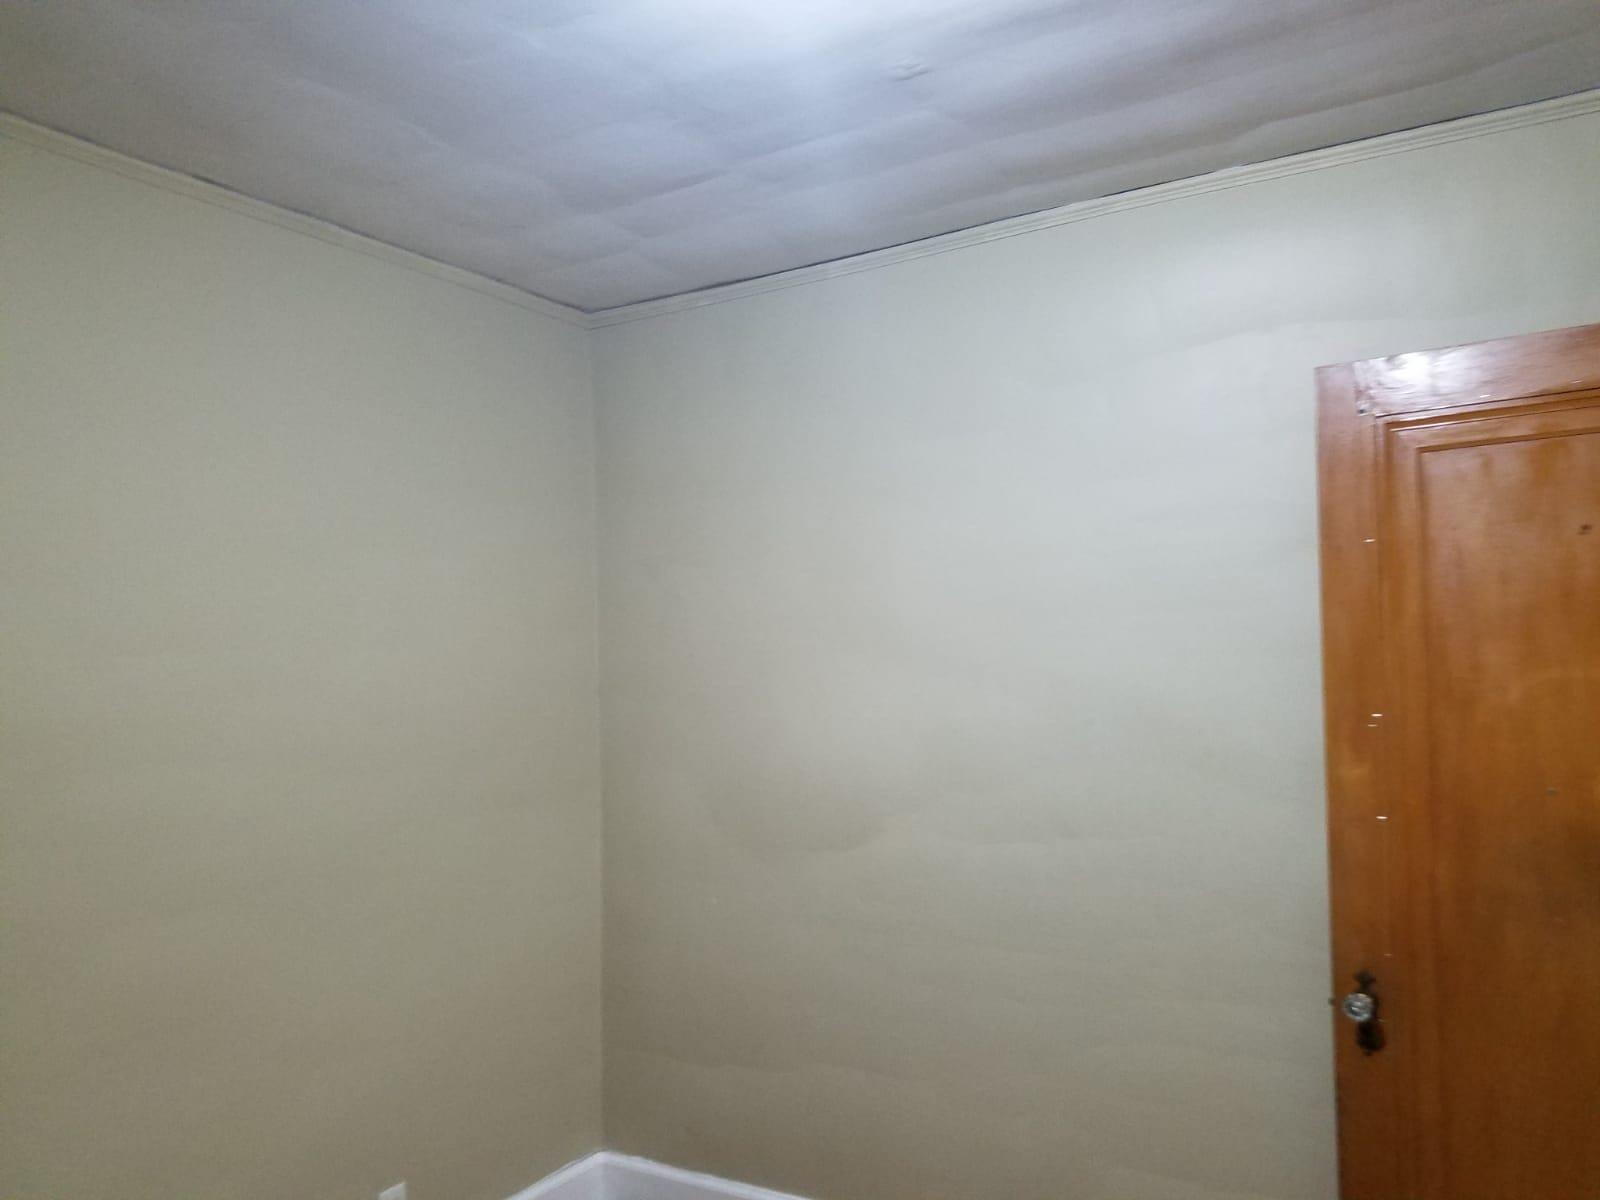 5590 Devonshire Rd Detroit MI 48224 Rehab - Sunrise Home improvements - cashflowpositive.com